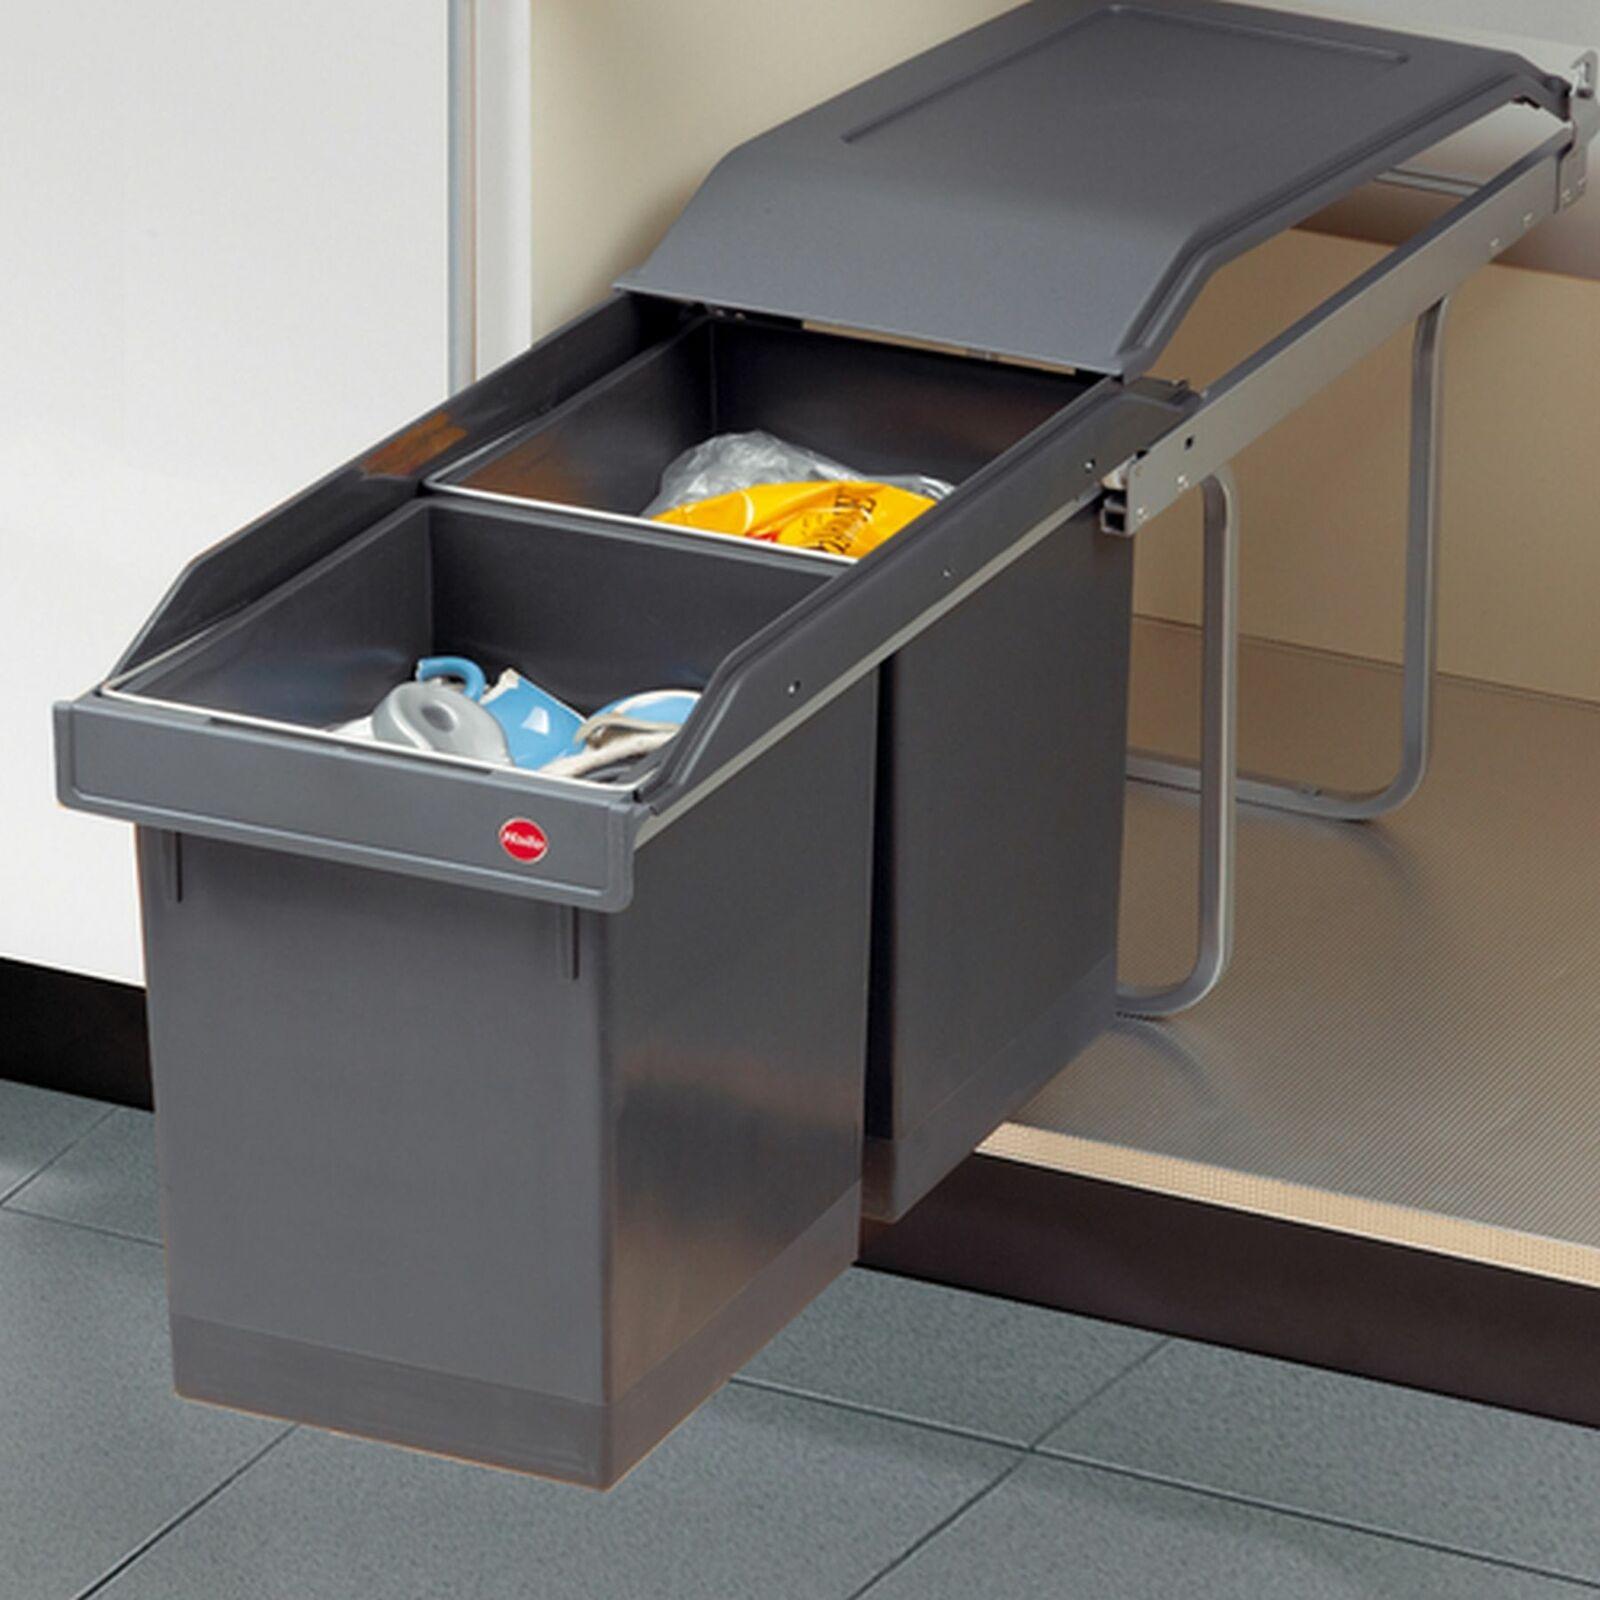 Full Size of Müllsystem 5e2706d664293 Küche Wohnzimmer Müllsystem